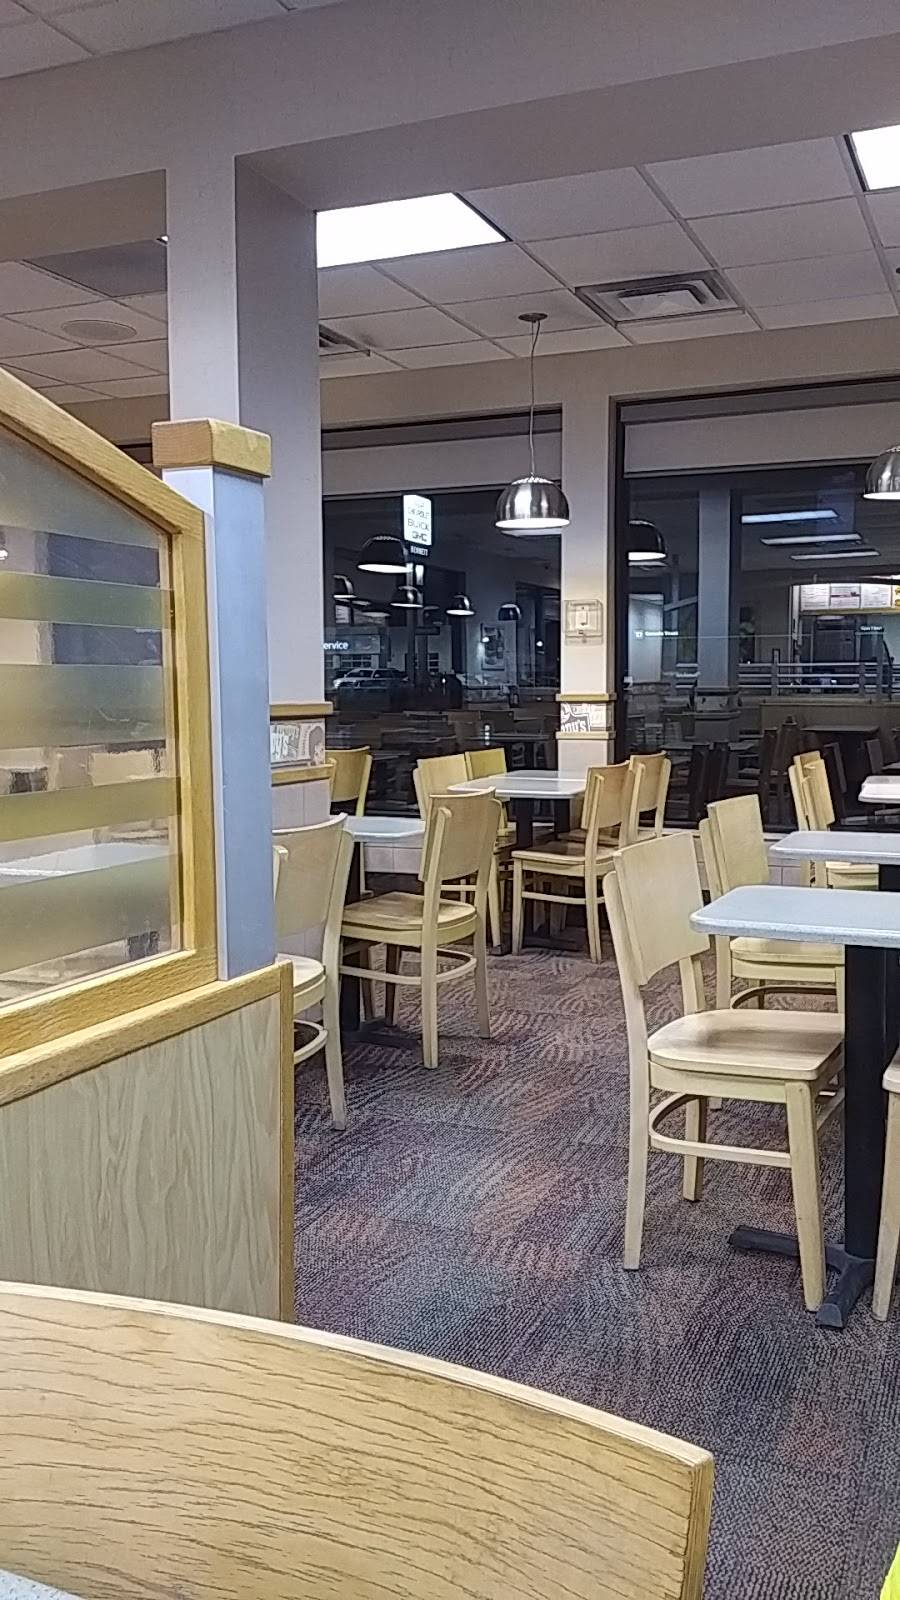 Wendys | restaurant | 430 Hespeler Rd, Cambridge, ON N1R 6J7, Canada | 5196234700 OR +1 519-623-4700